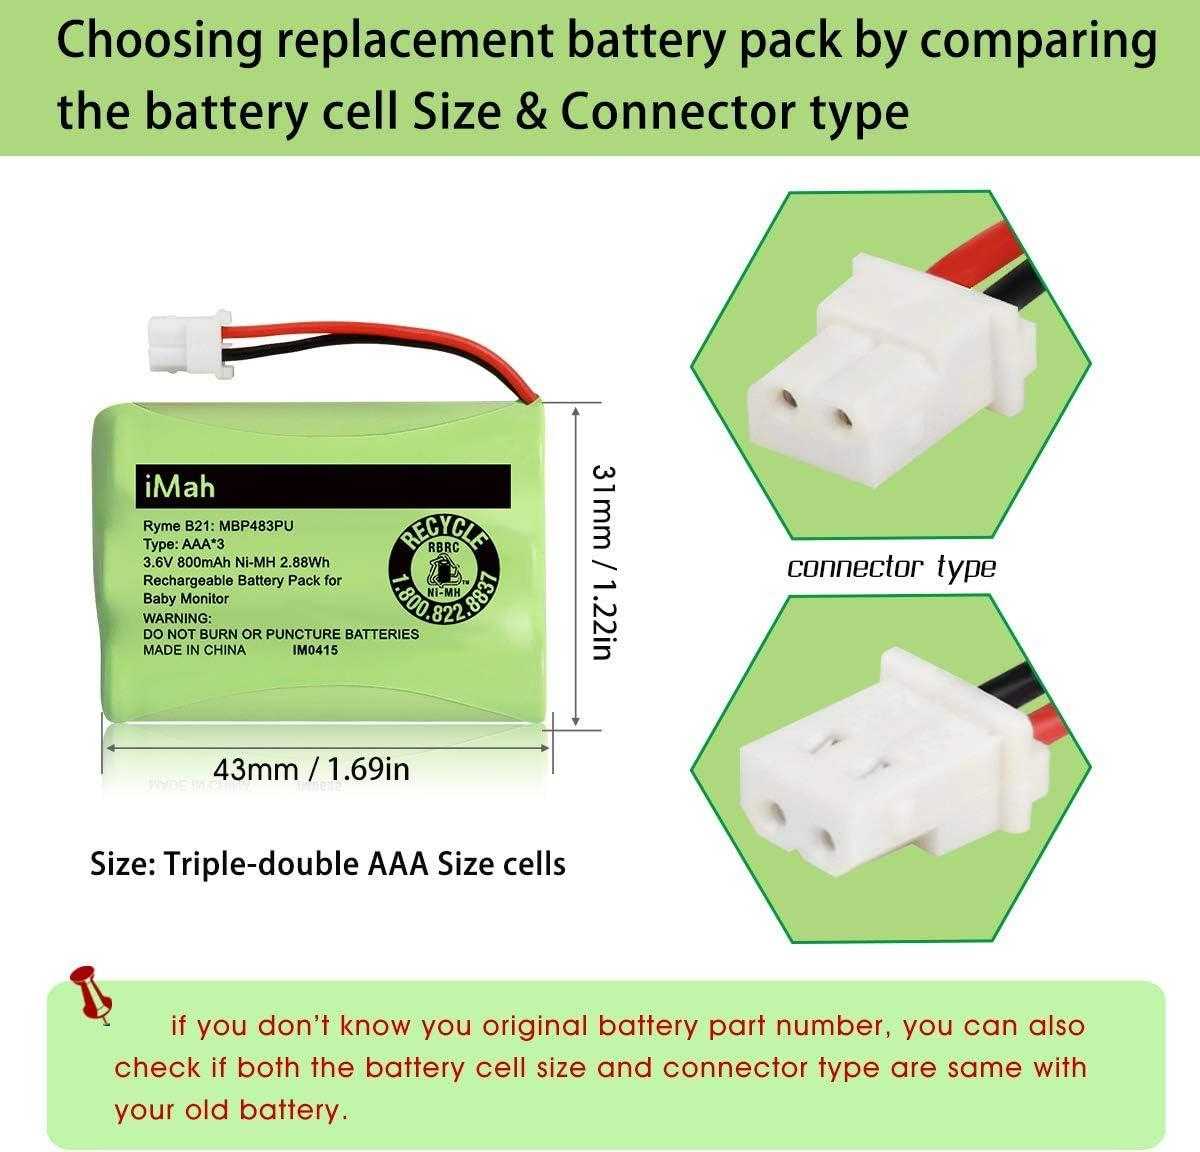 VTech BT207695 VM312 VM3251 VM3252 VM3261 2-Pack iMah Ryme B21 Battery Compatible with Motorola Baby Monitor MBP33XLPU MBP481PU MBP482PU MBP483PU only fits MBP33S MBP36 MBP36S Newer 800mAh Version